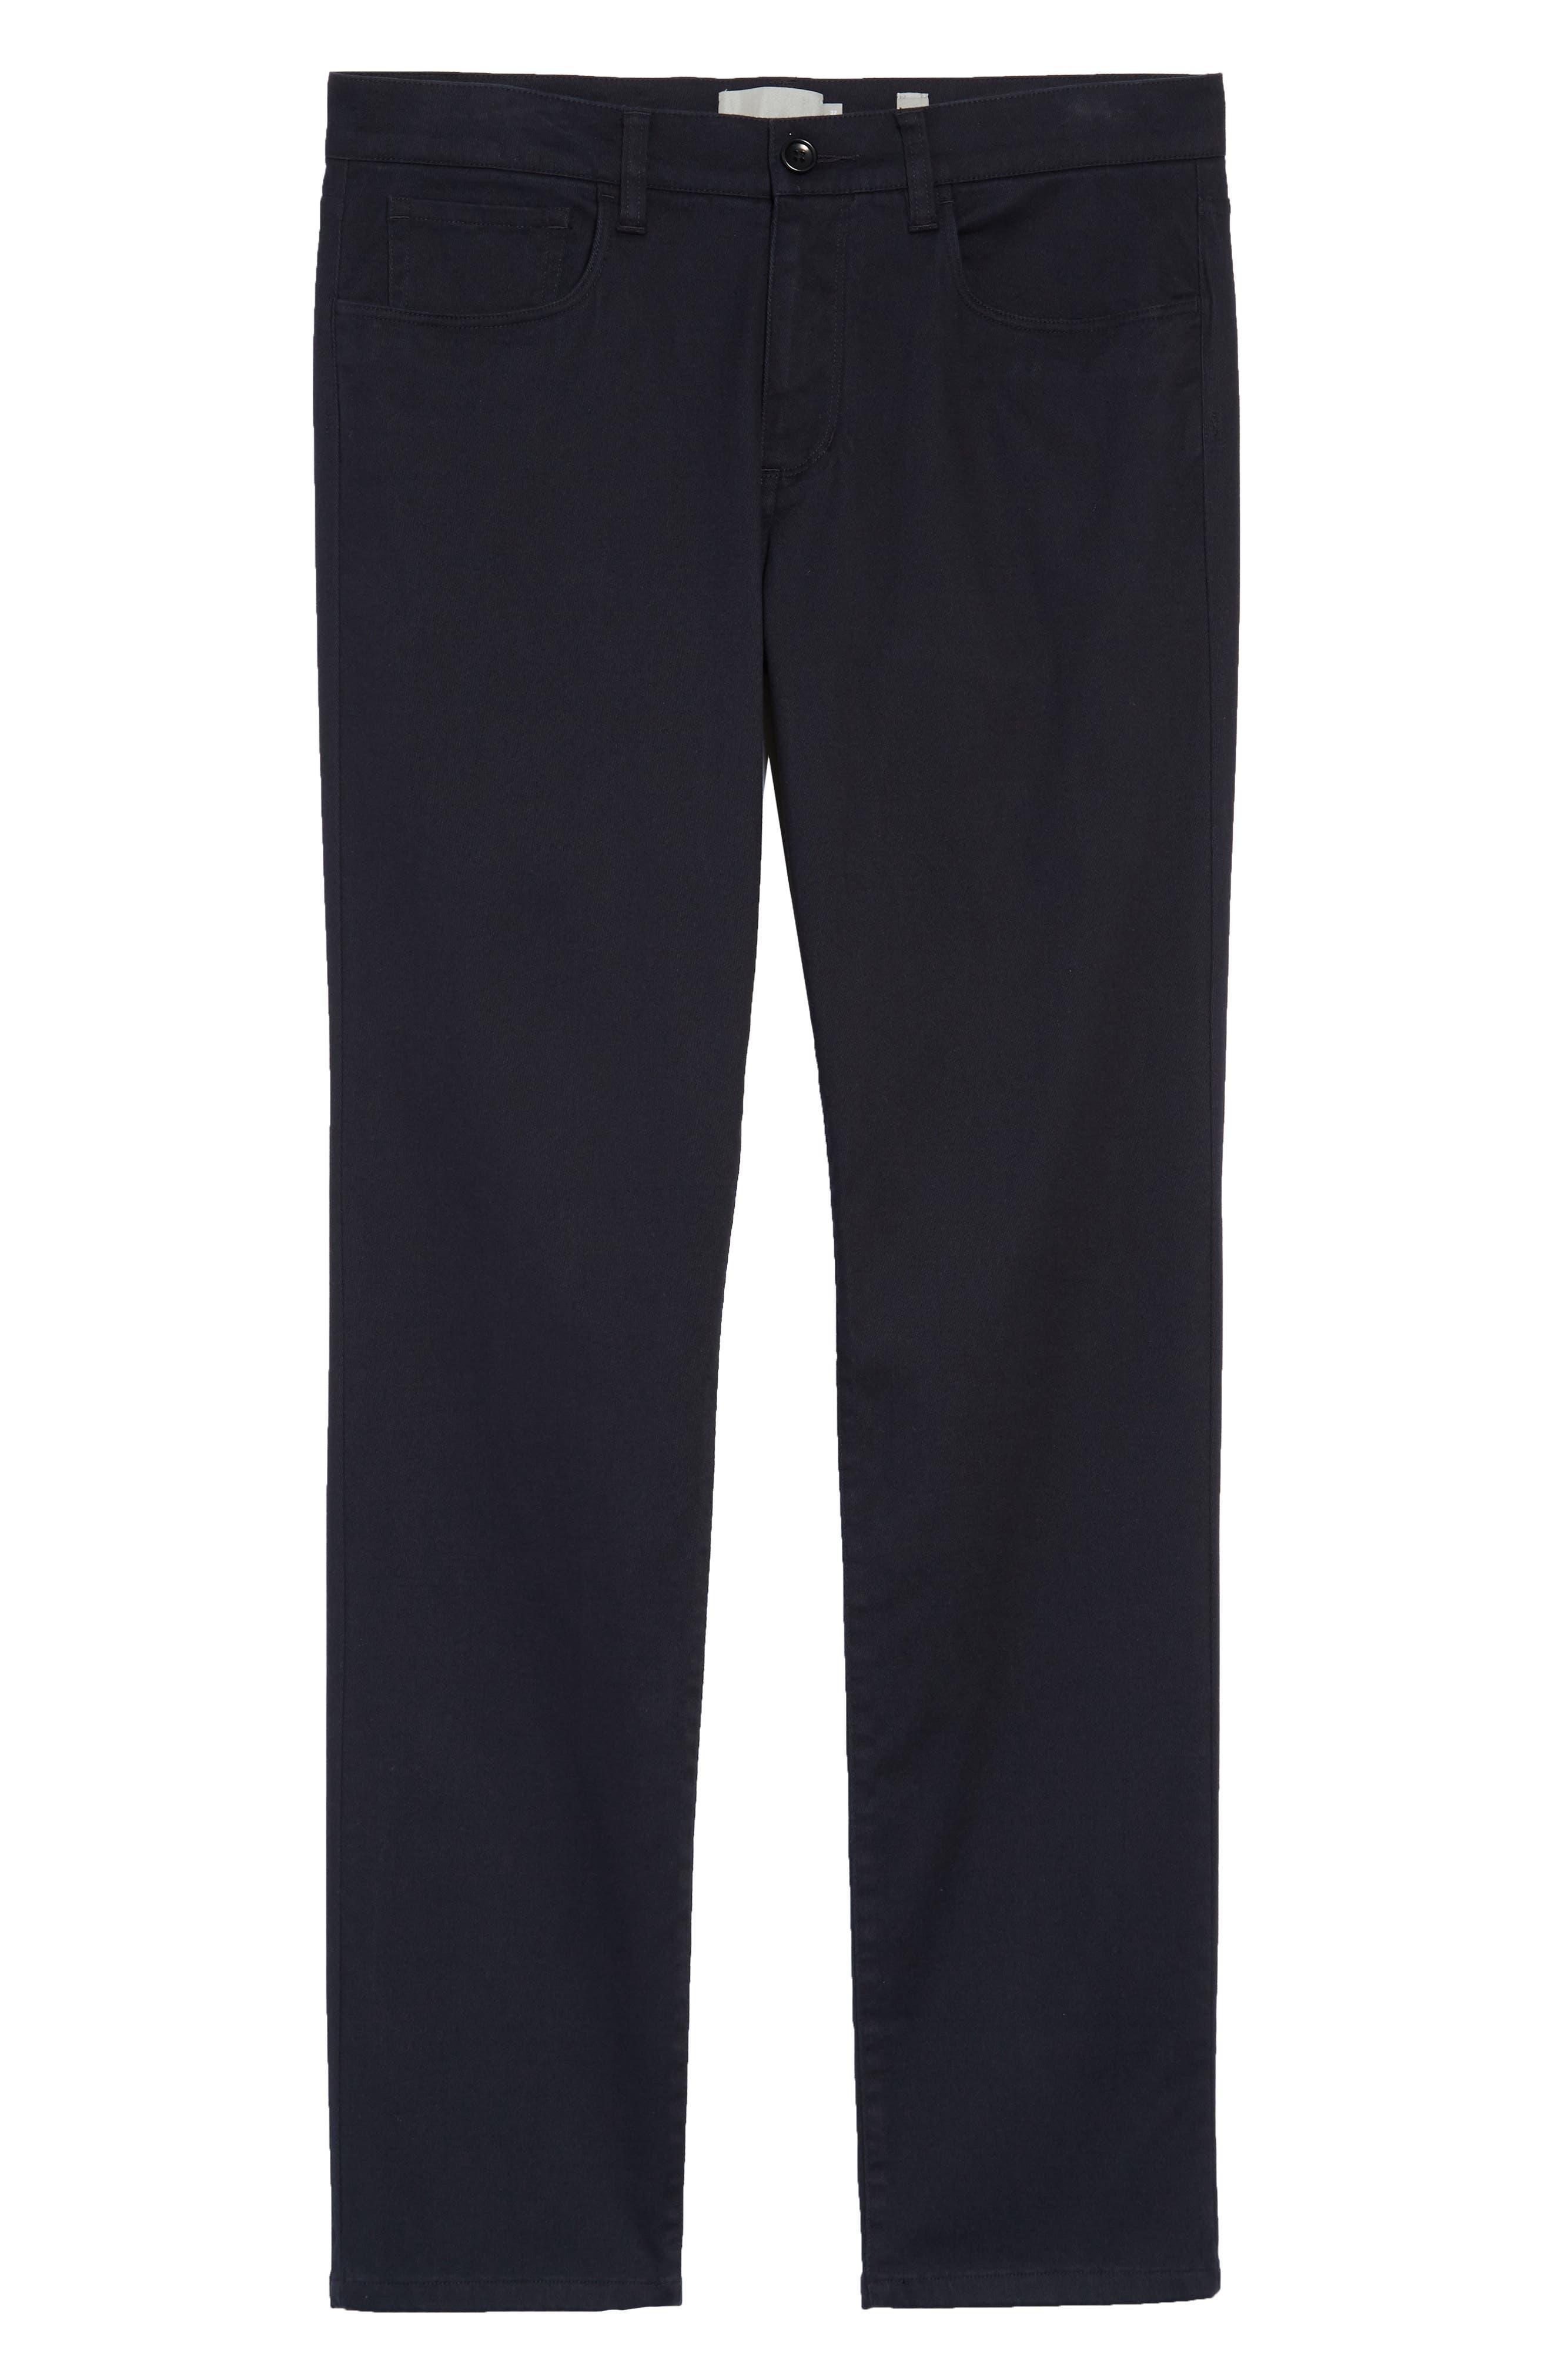 Soho Slim Fit Five-Pocket Pants,                             Alternate thumbnail 3, color,                             COASTAL